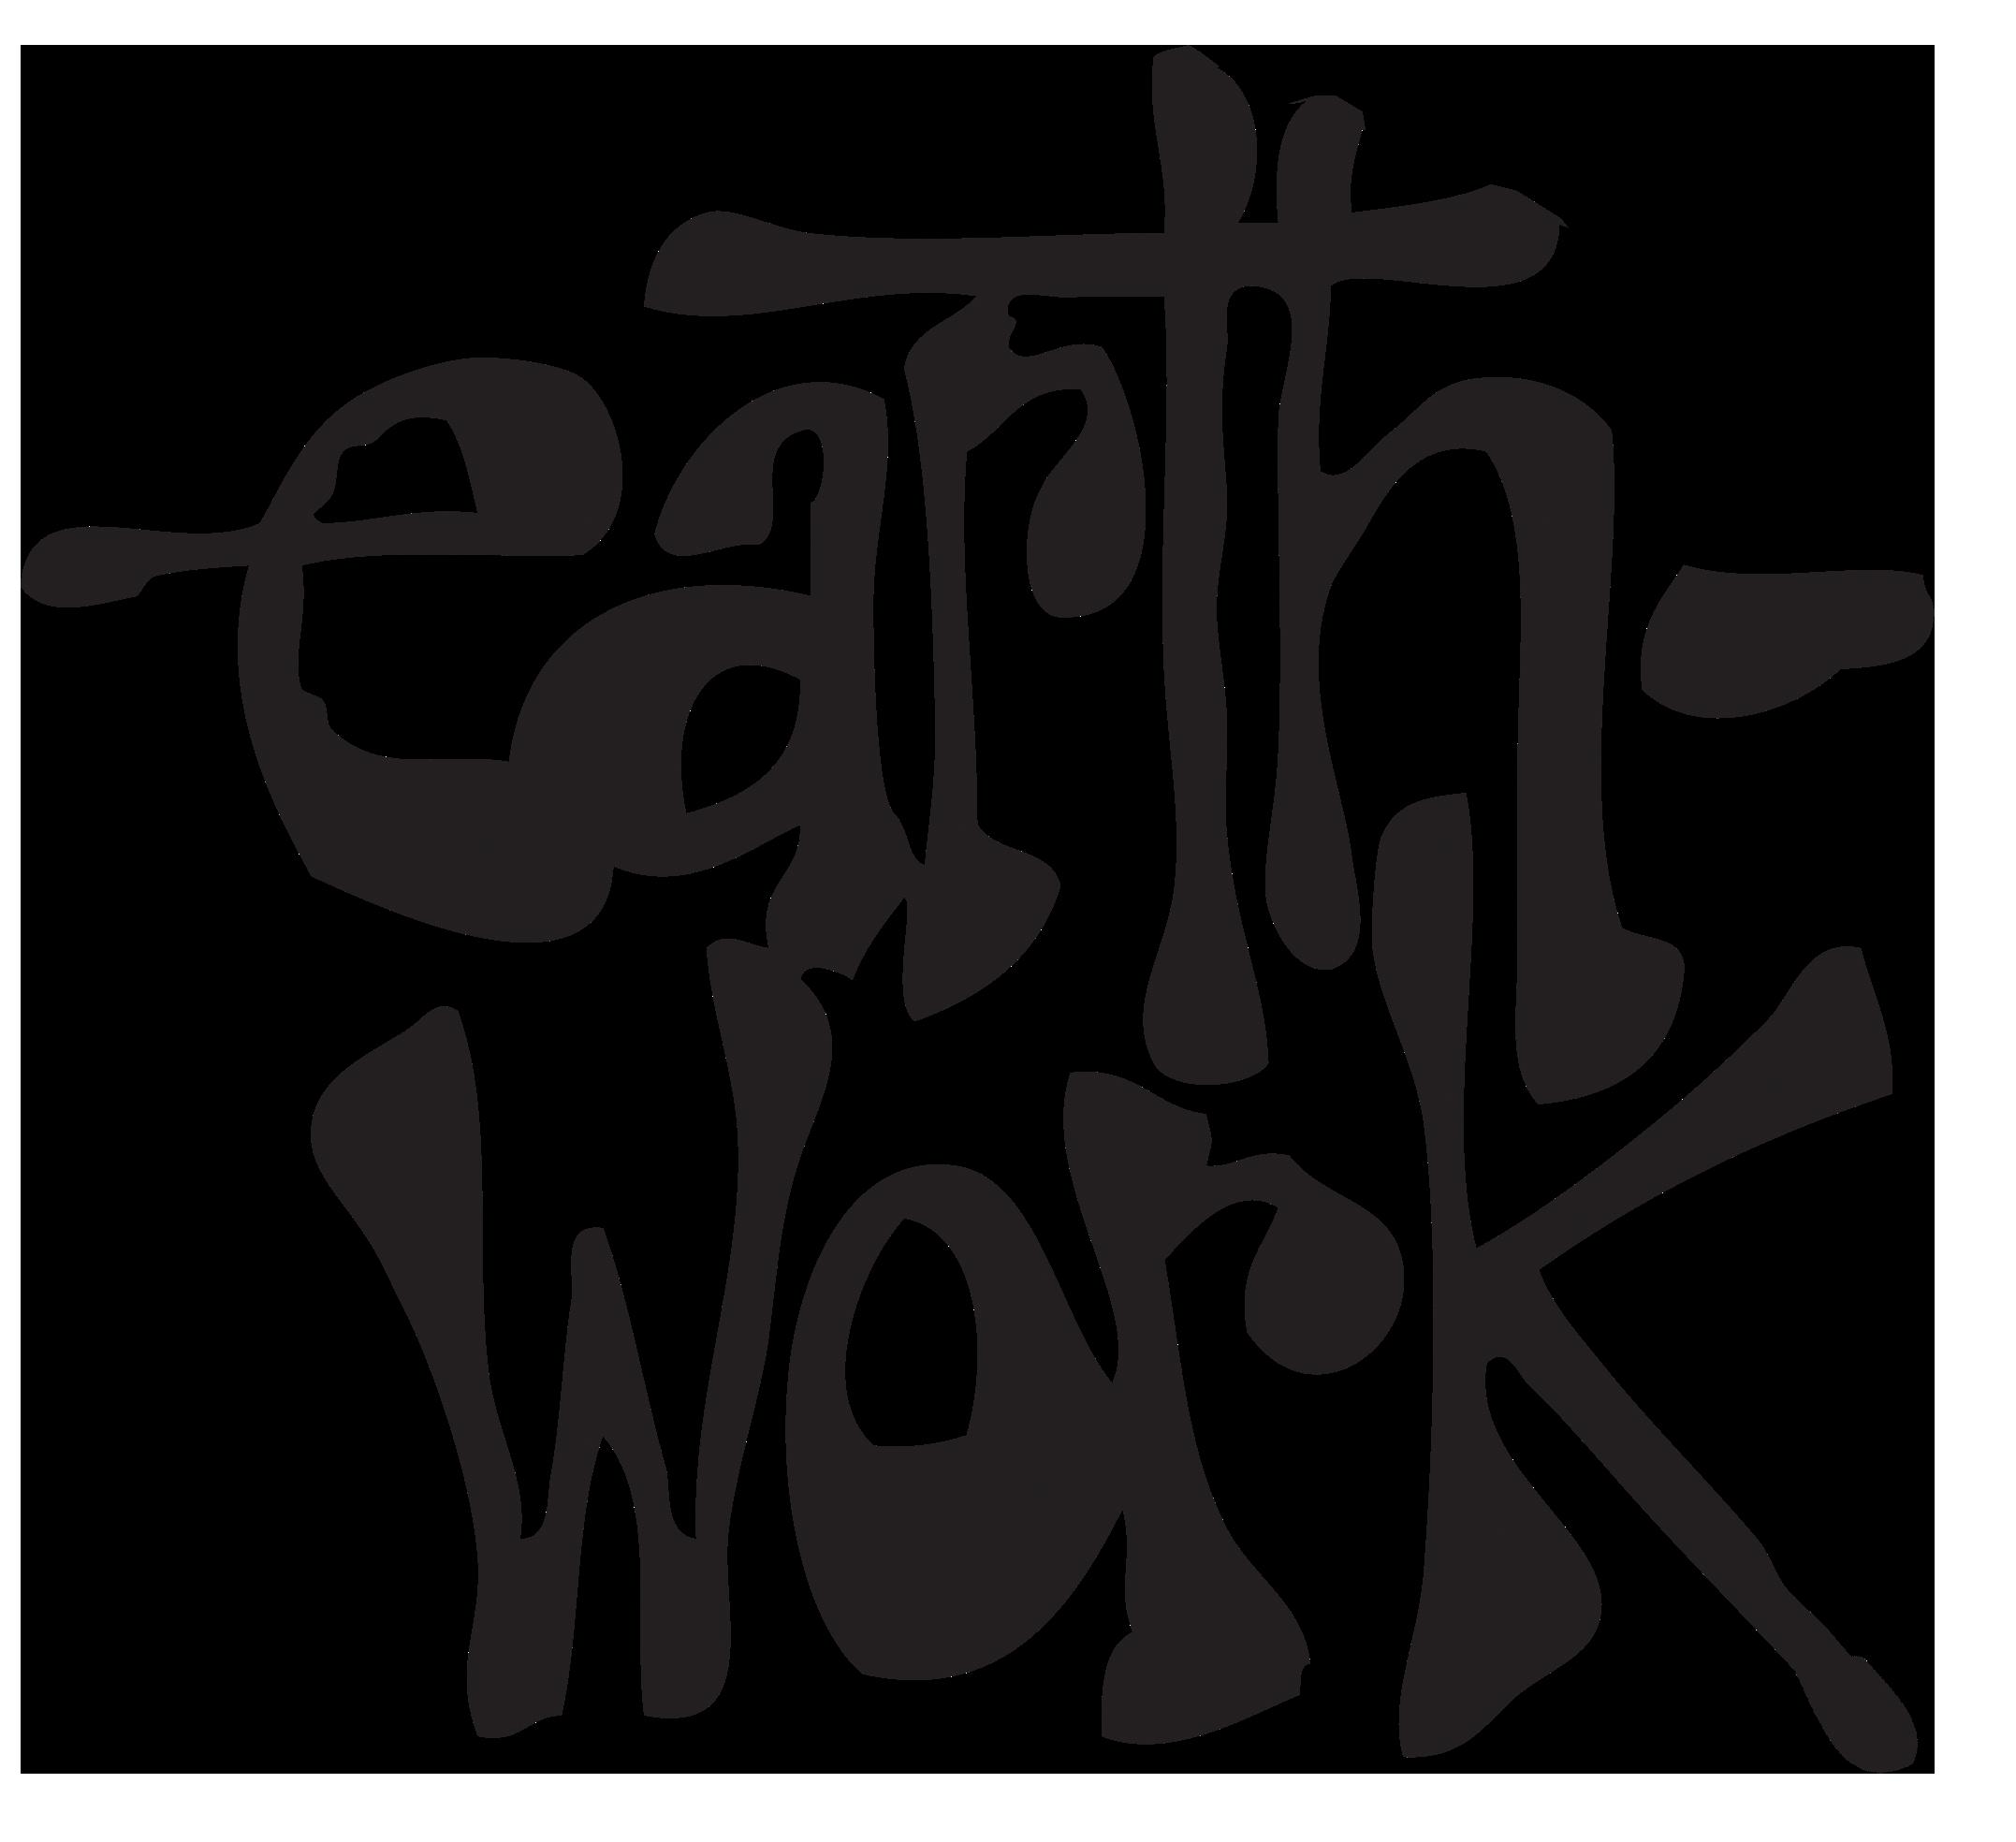 Earthwork-word.png